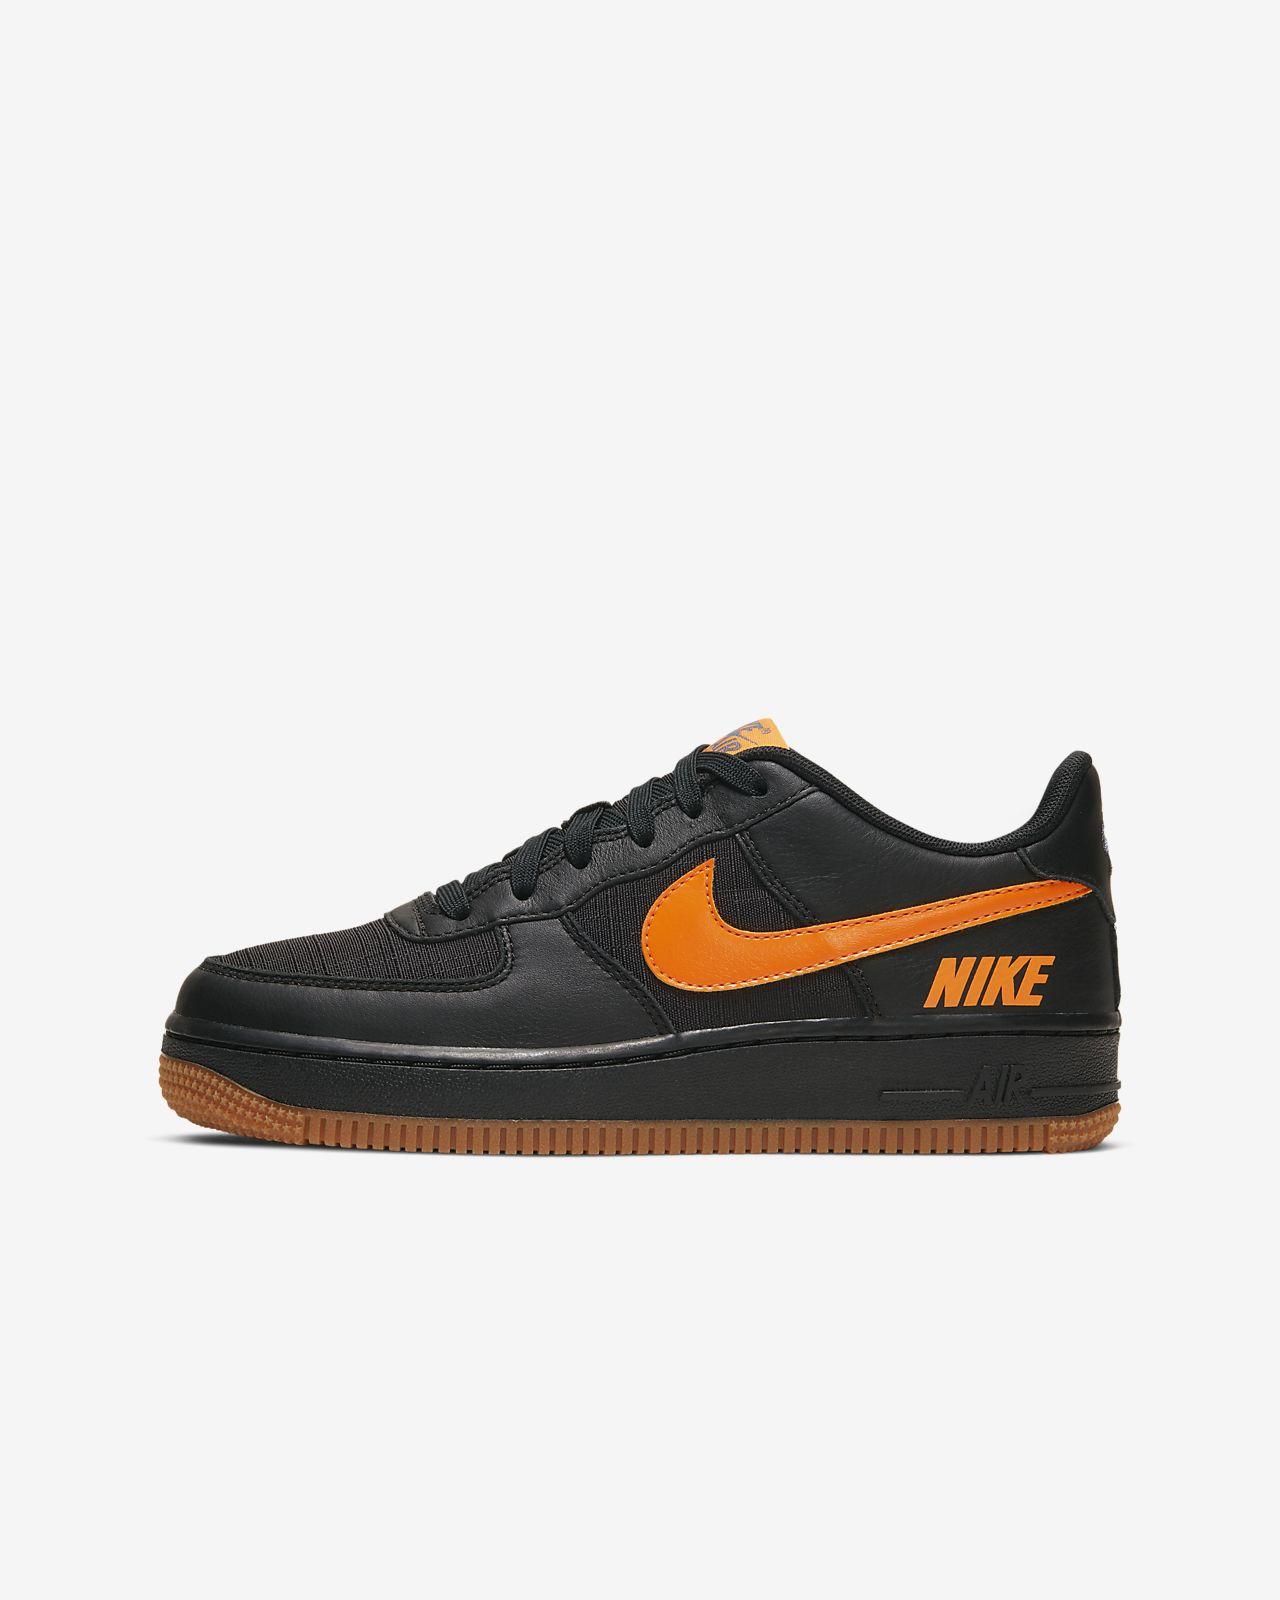 Nike Air Force 1 LV8 5 Zapatillas - Niño/a